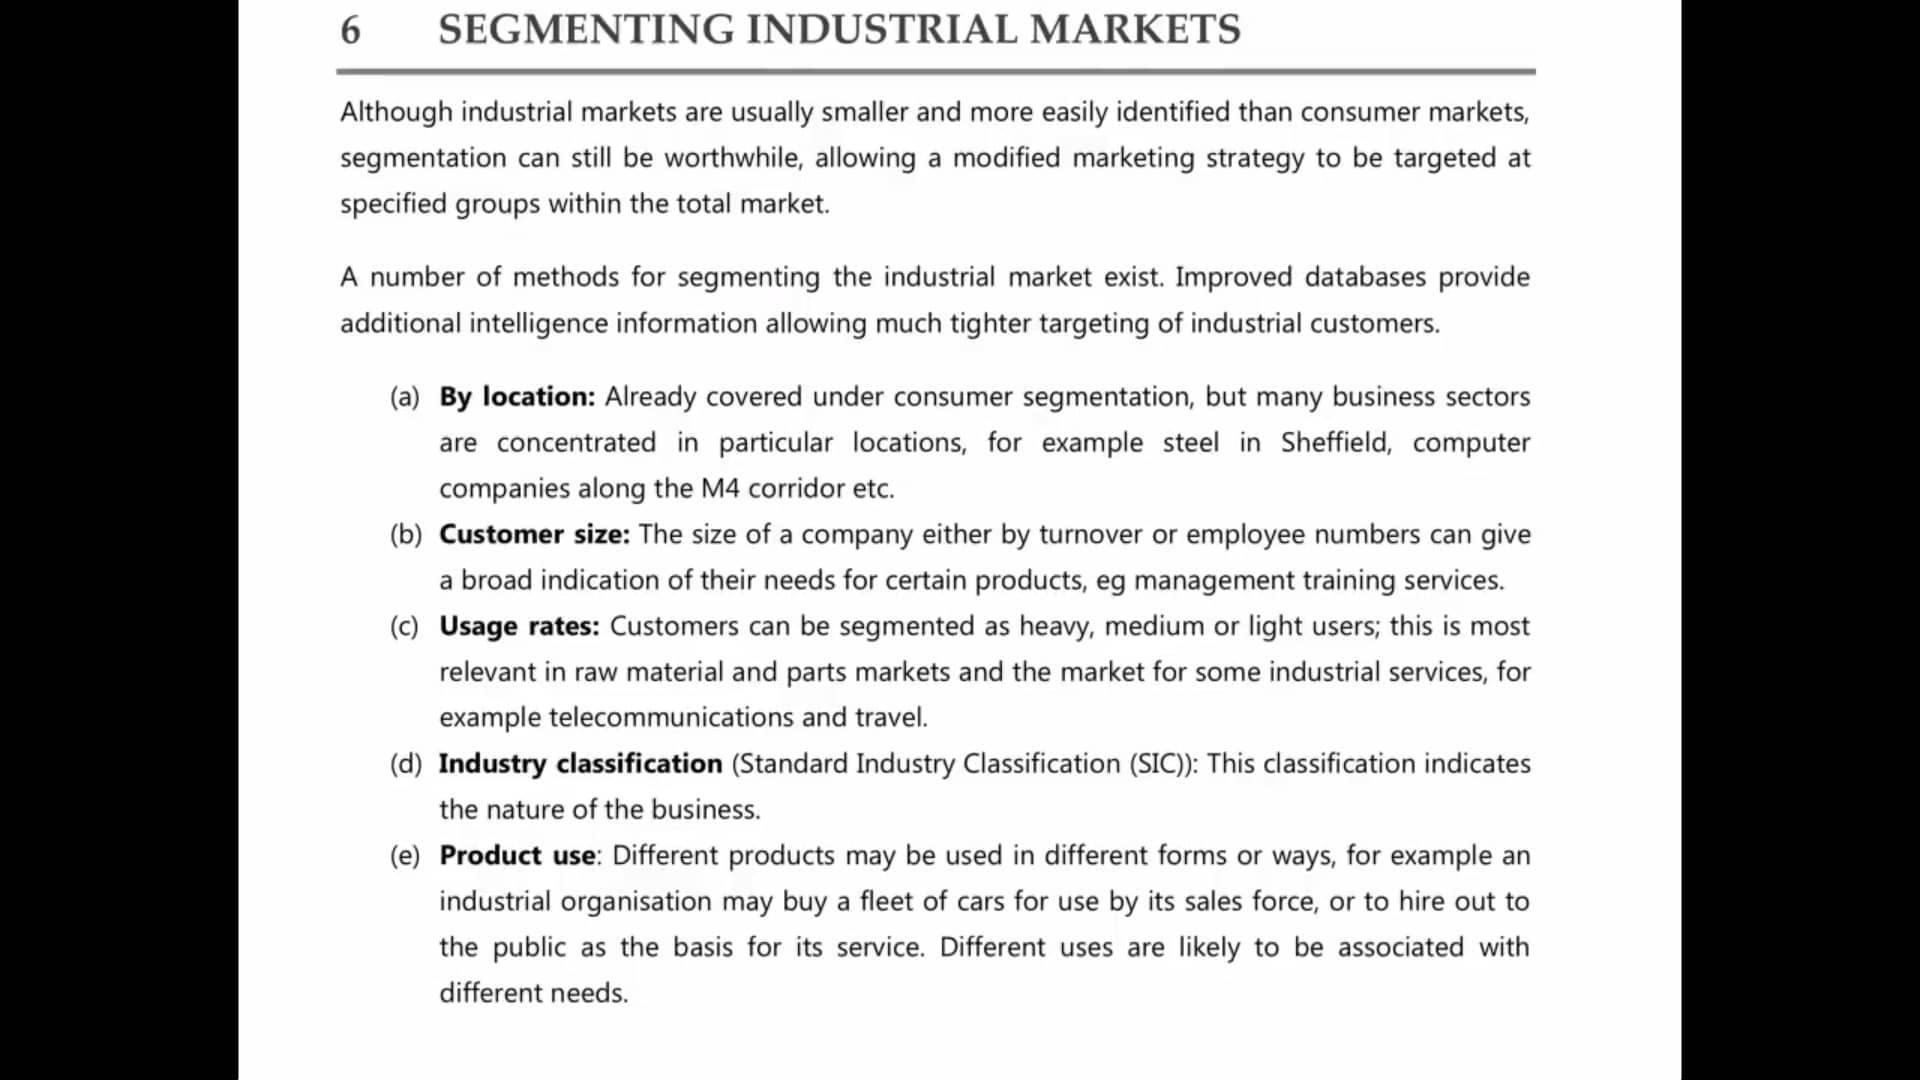 Ch 6. Segmenting Industry Market 6